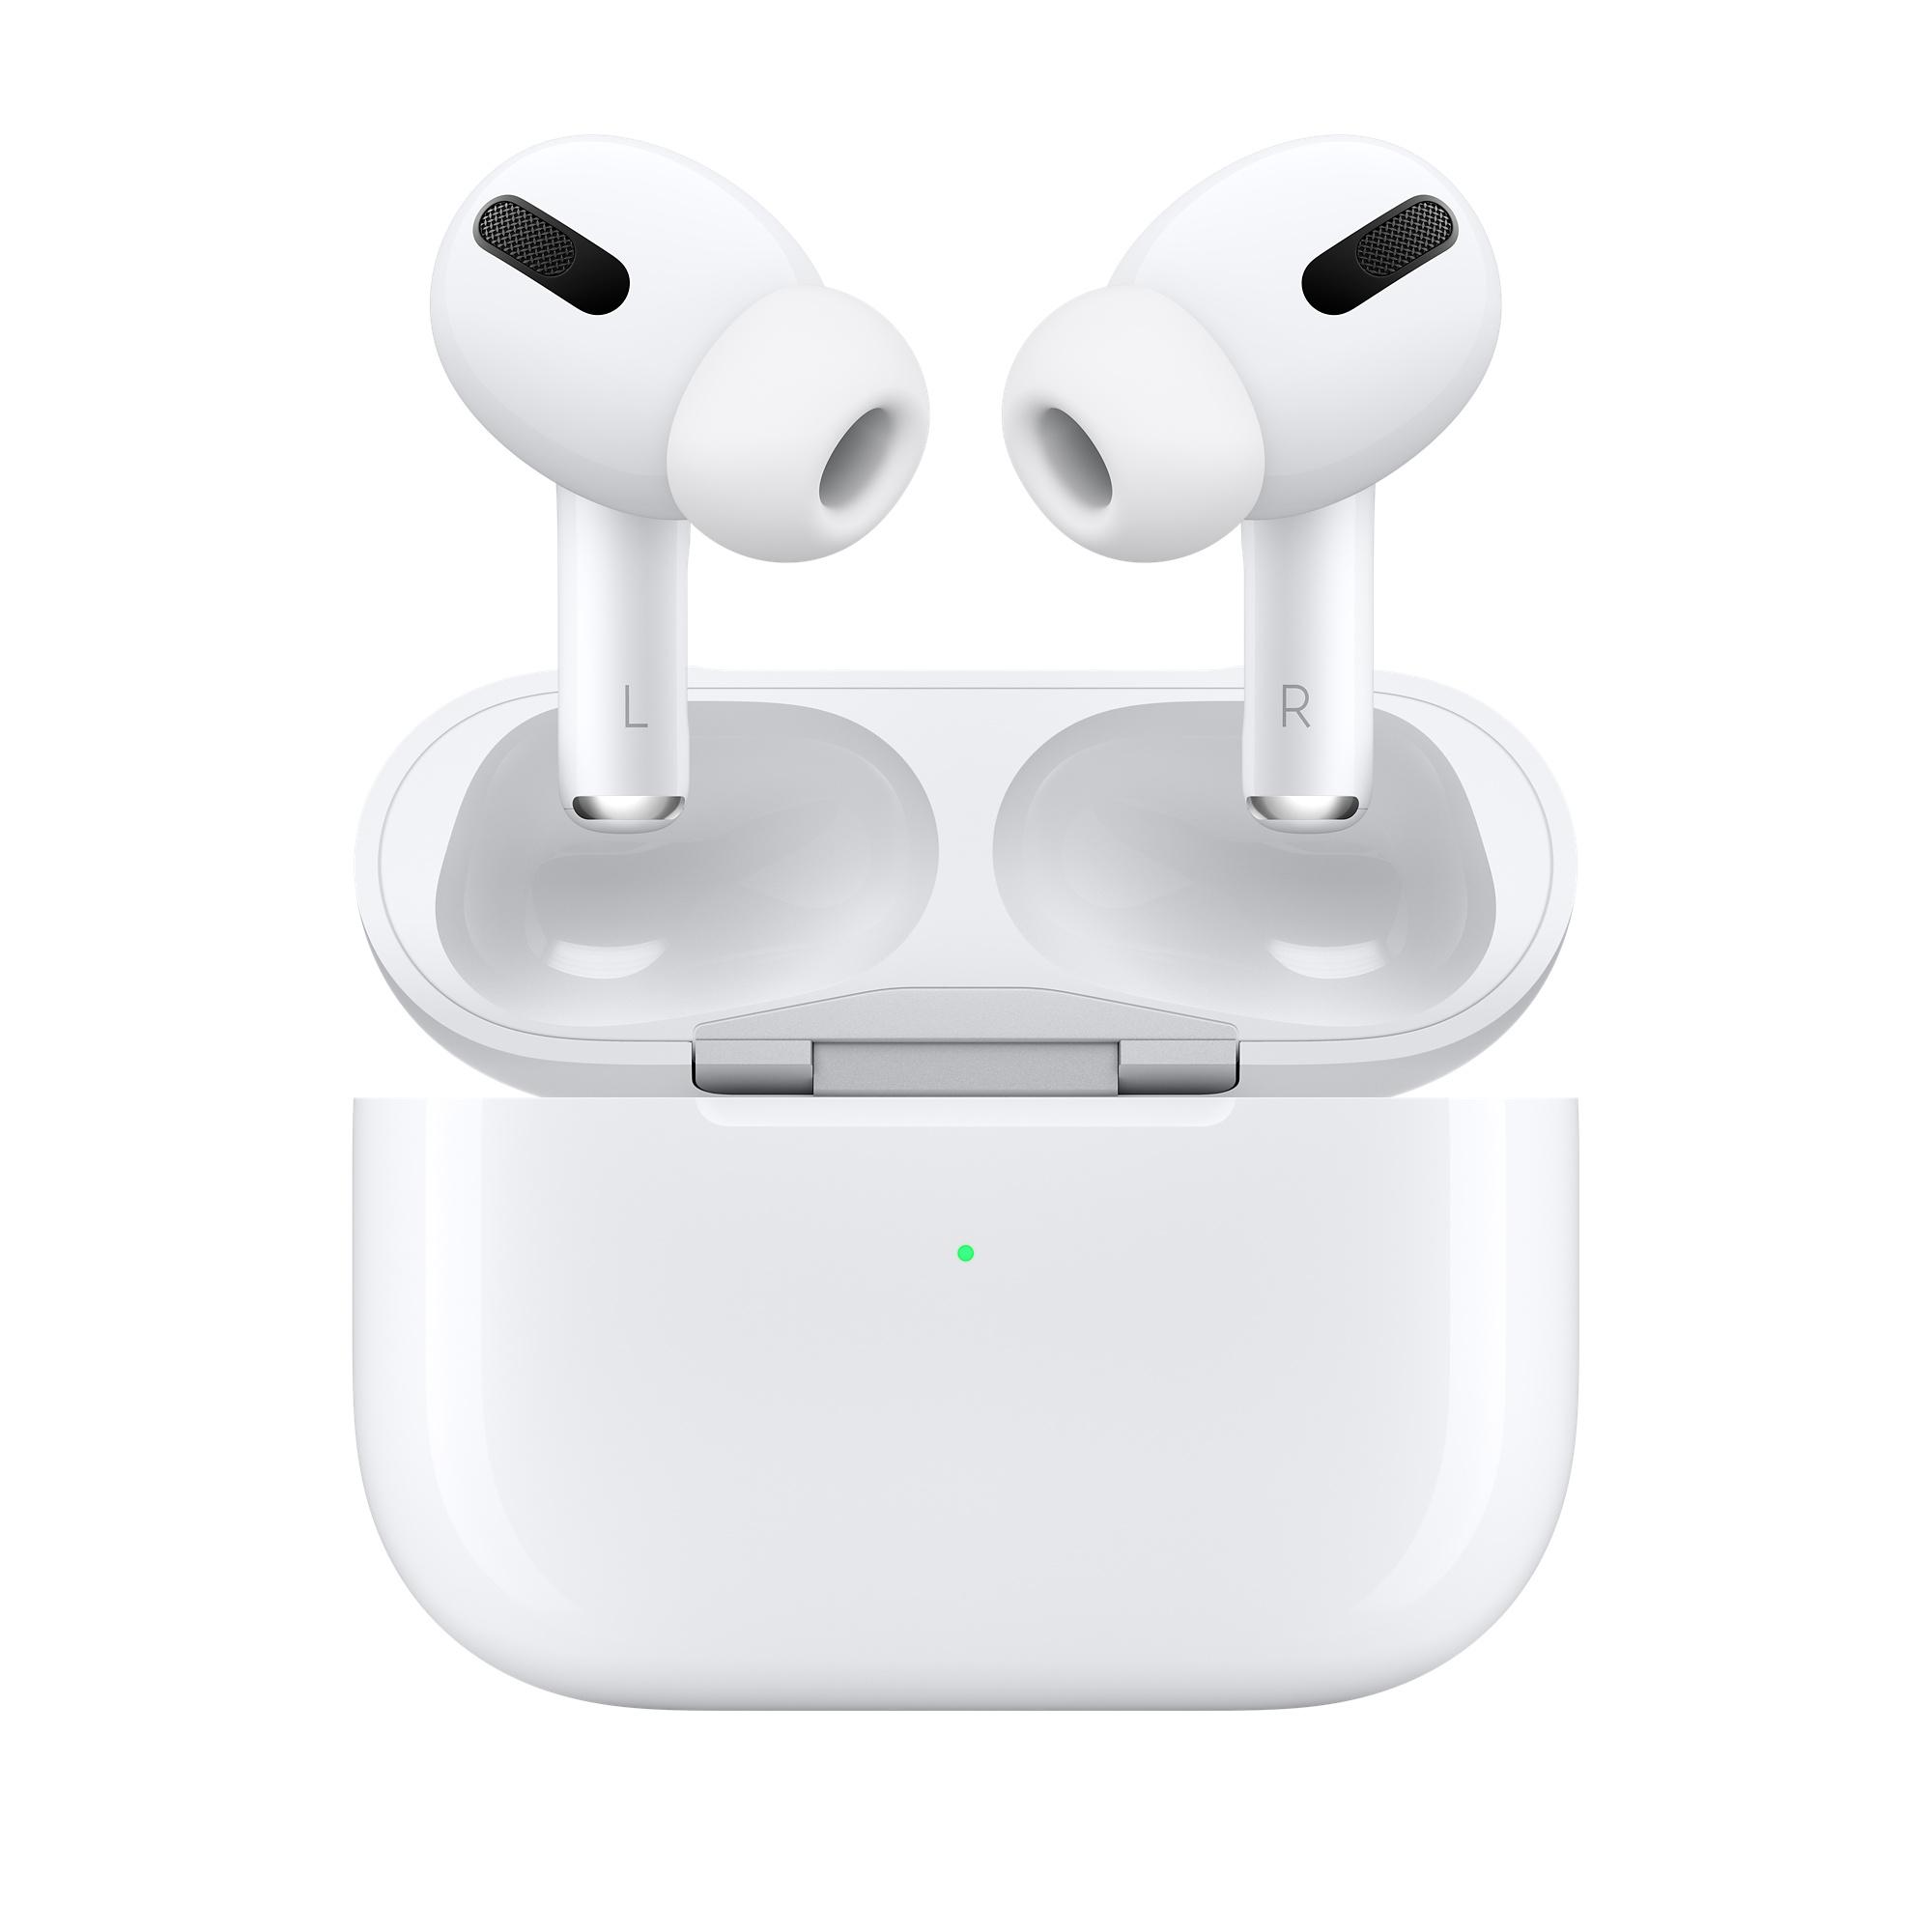 AirPods Proを購入 - Apple(日本)